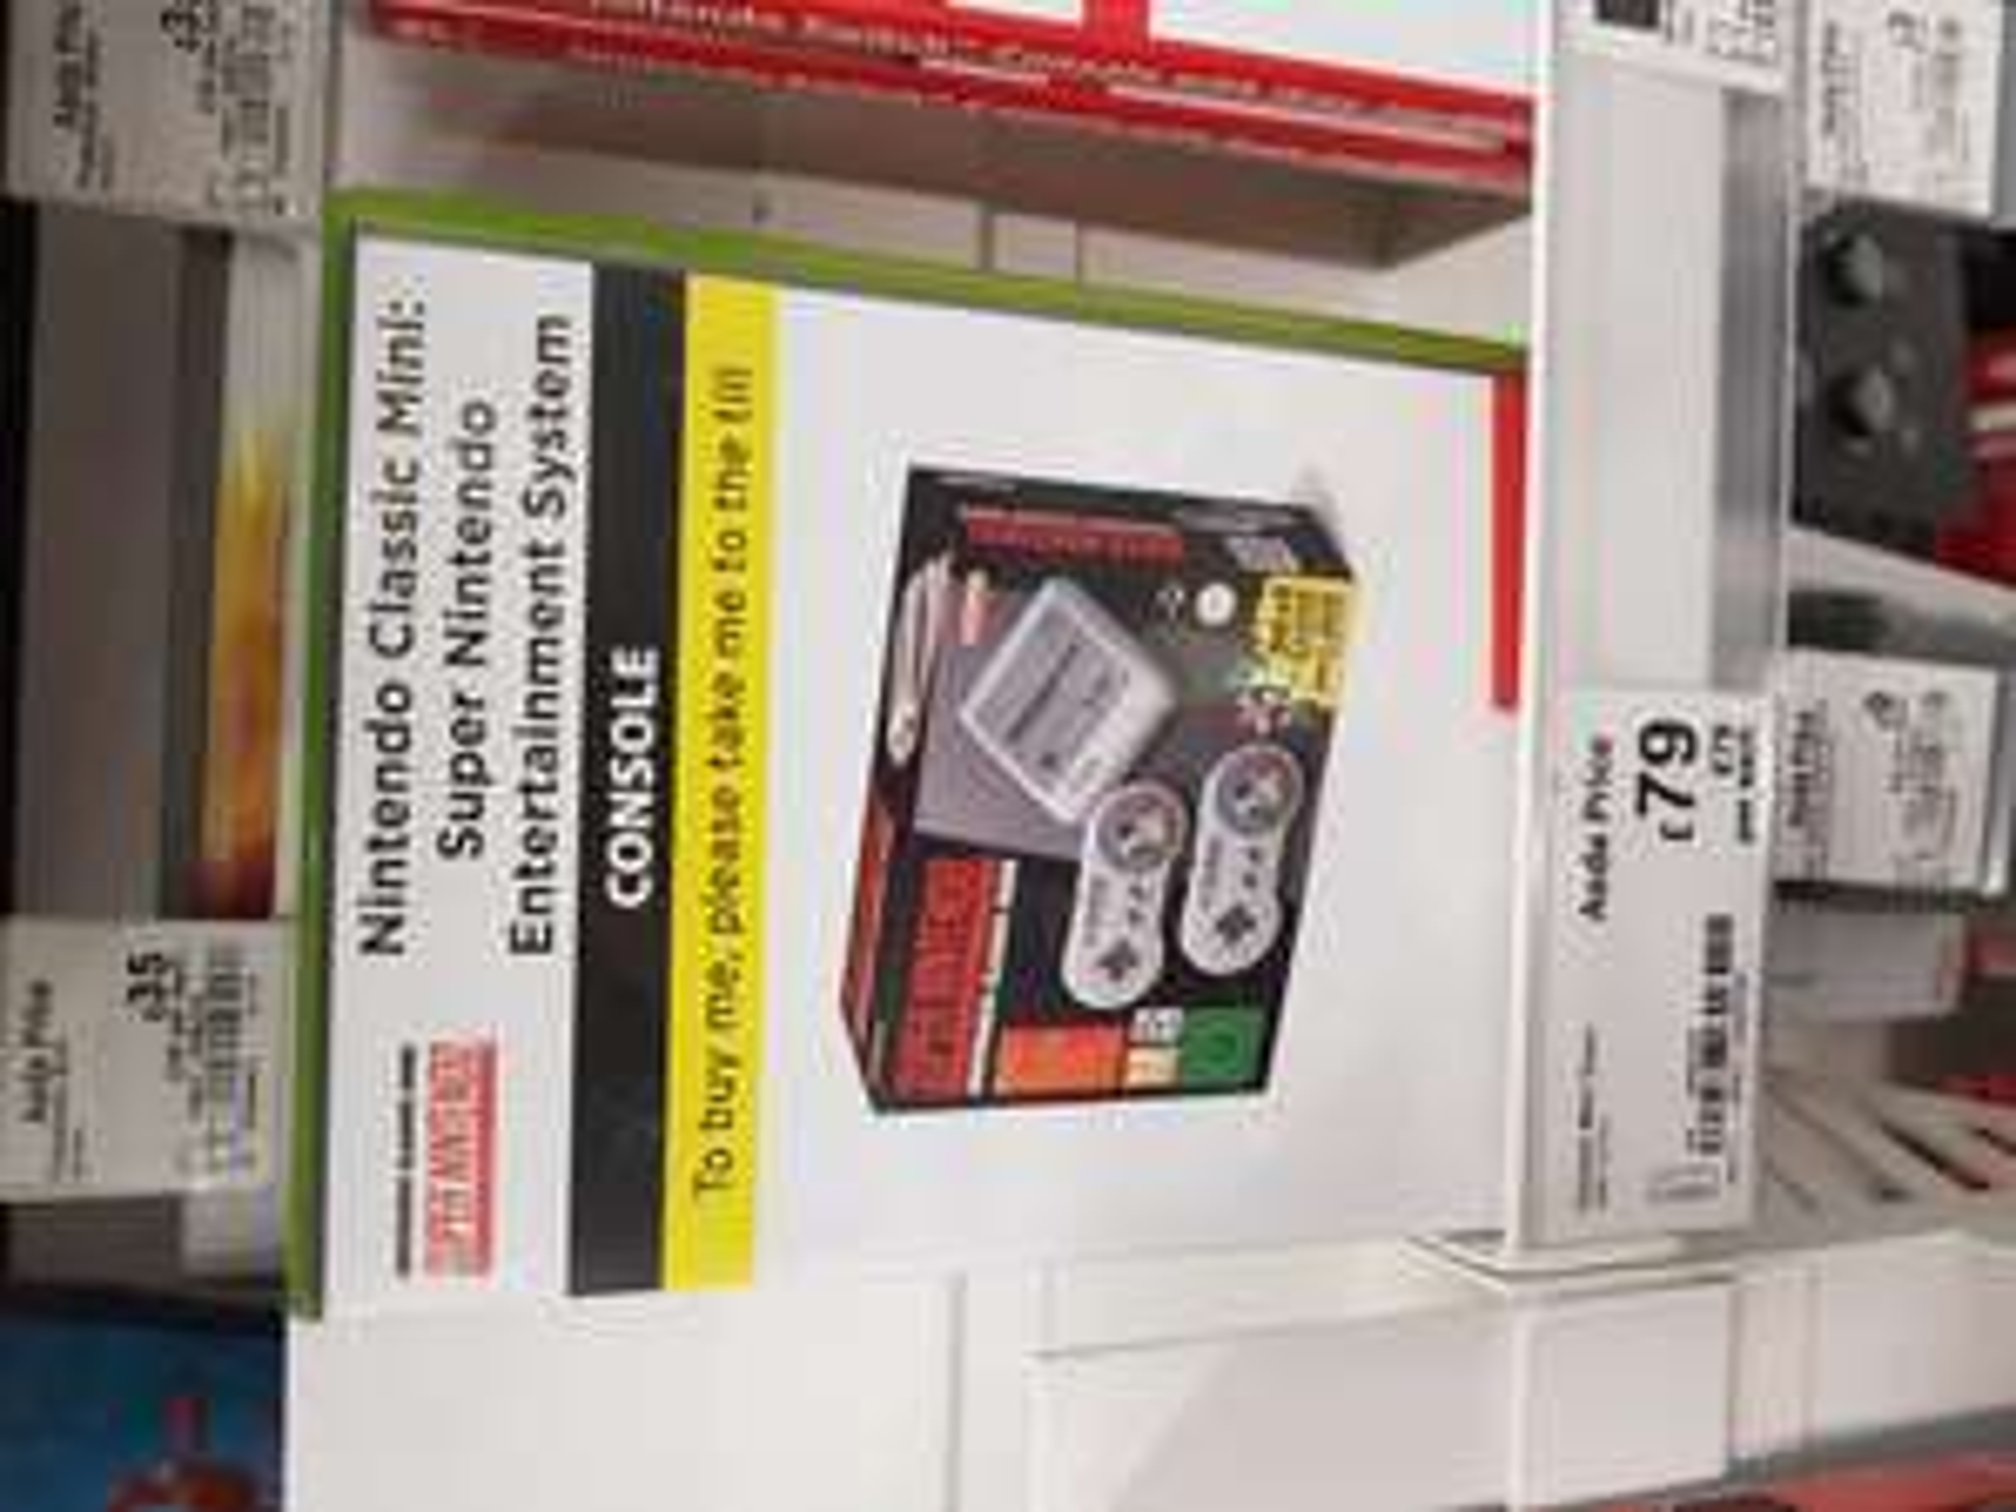 SNES mini classic Nintendo £79 Asda in-store Ashton-Under-Lyne